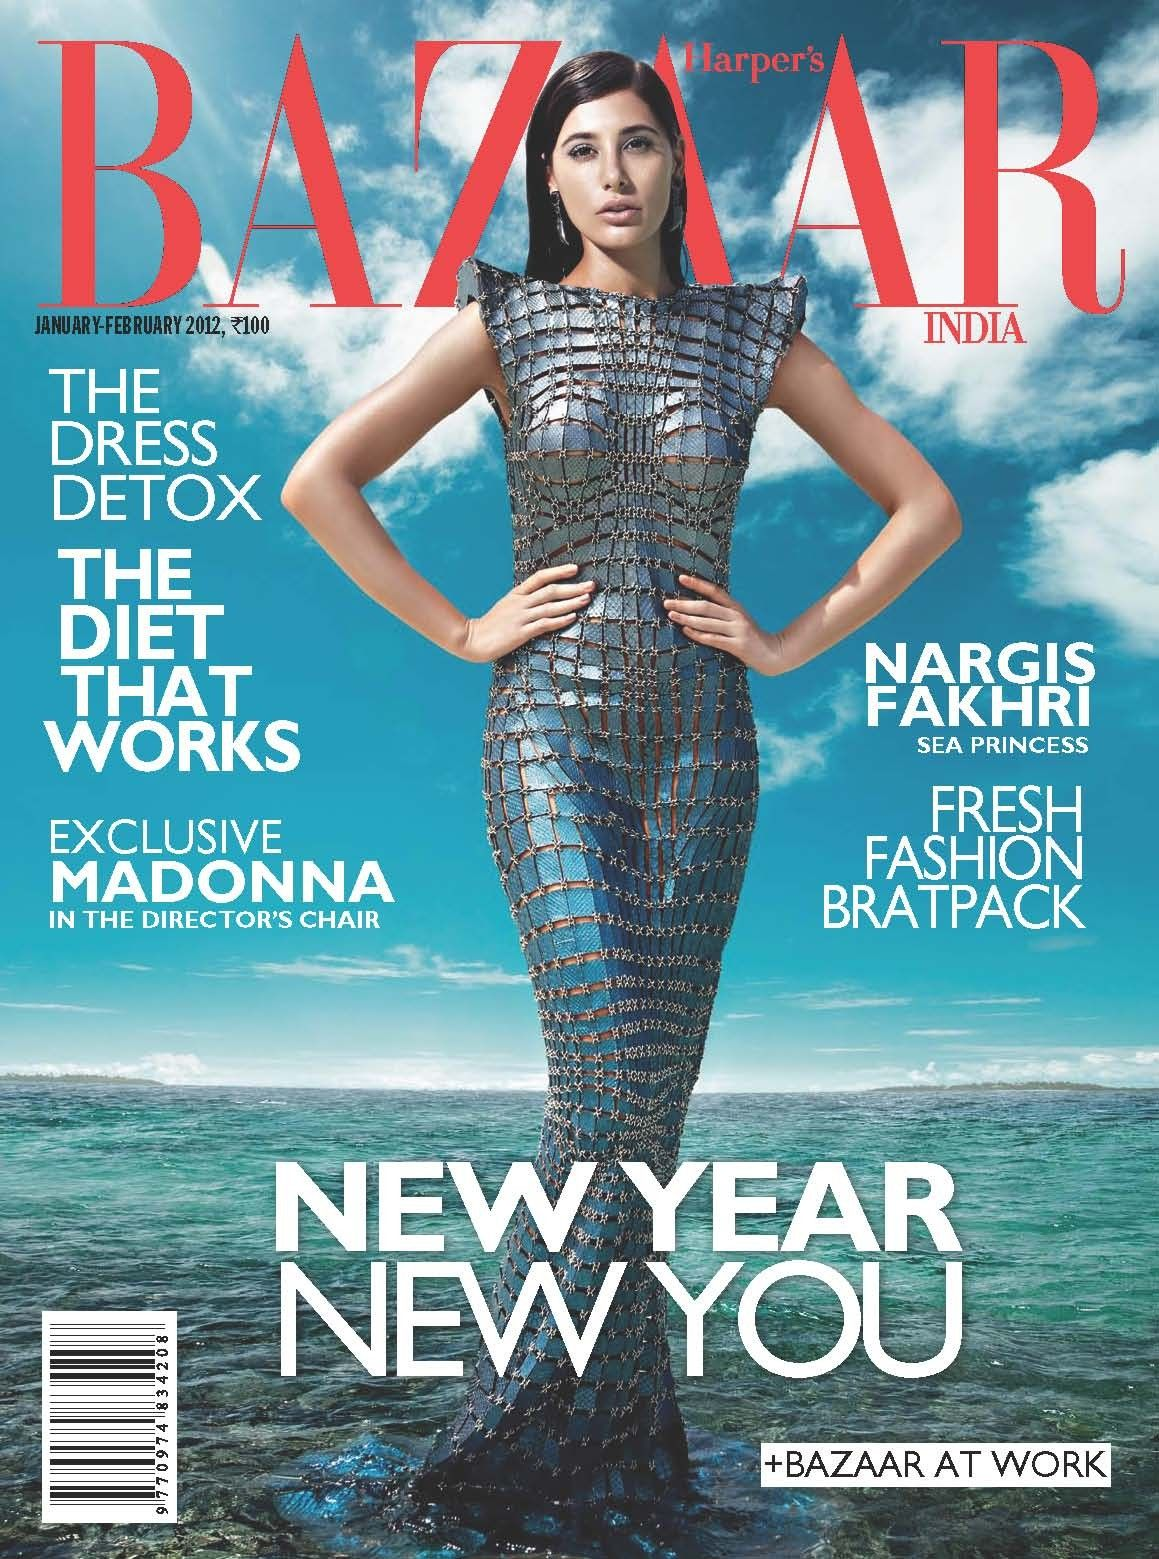 Harper's Bazaar India Magazine - Buy, Subscribe, Download and Read